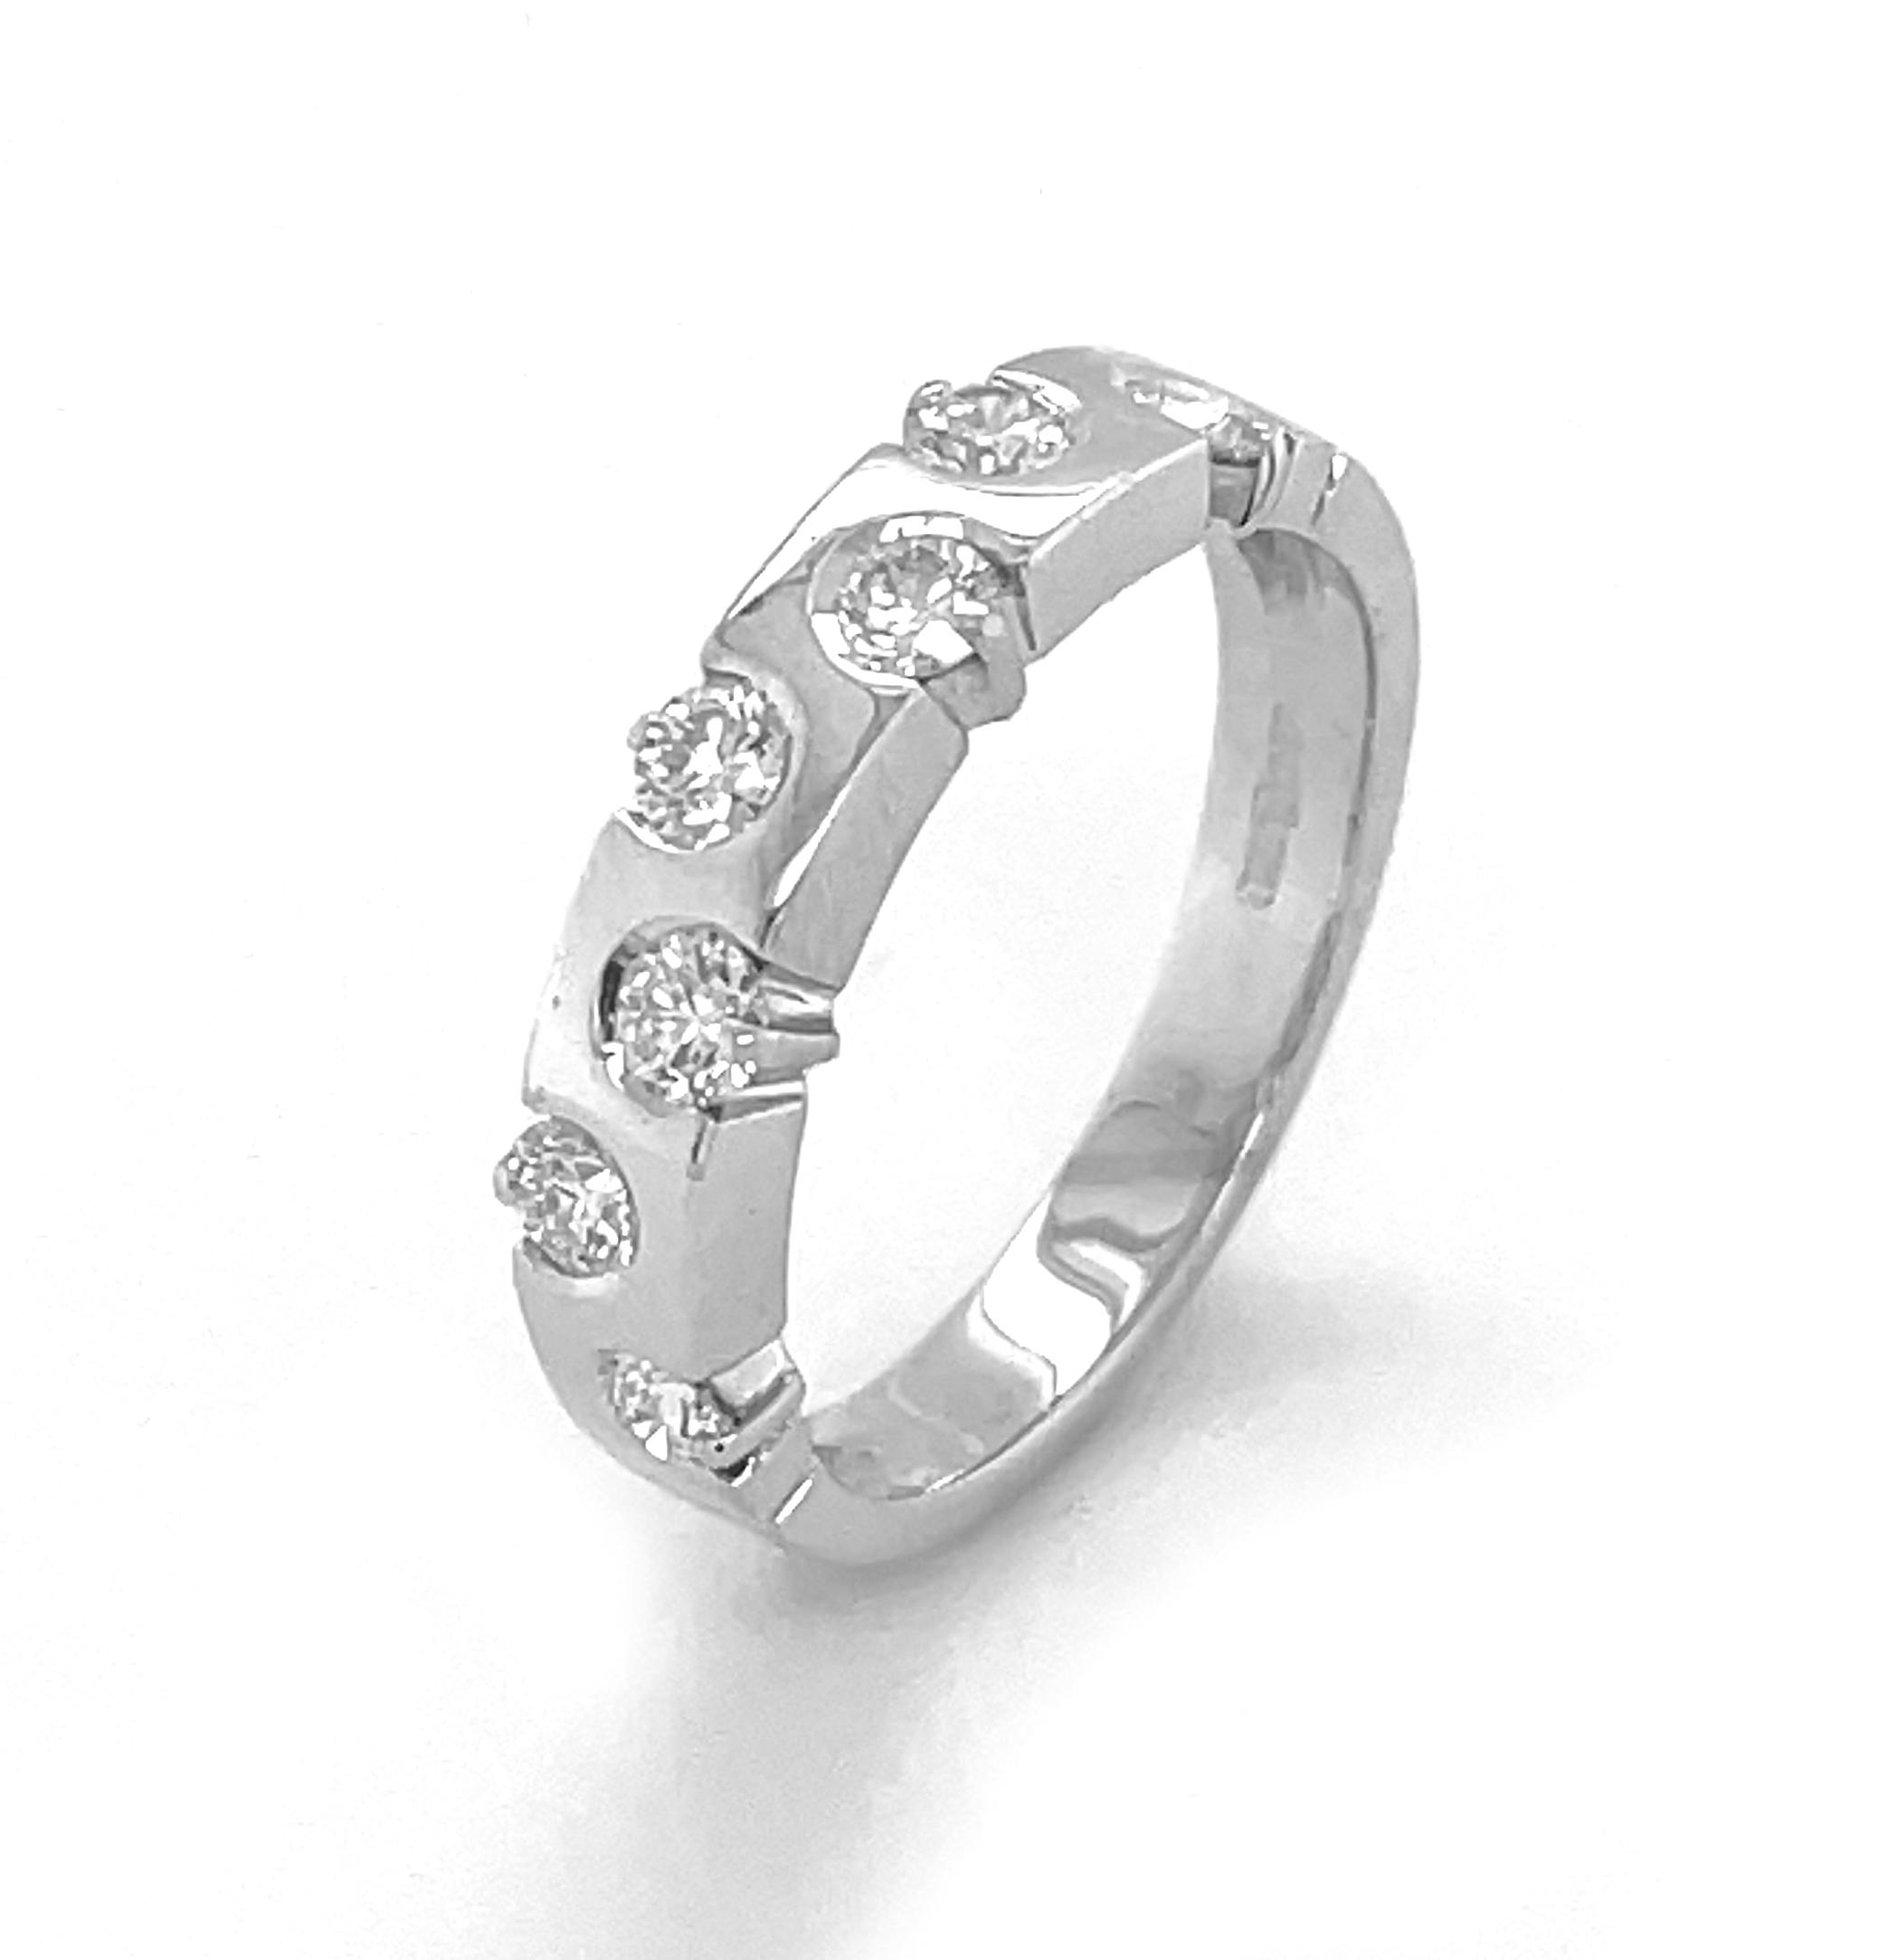 18k White Gold 7 Stone Brilliant Cut Diamond Ring